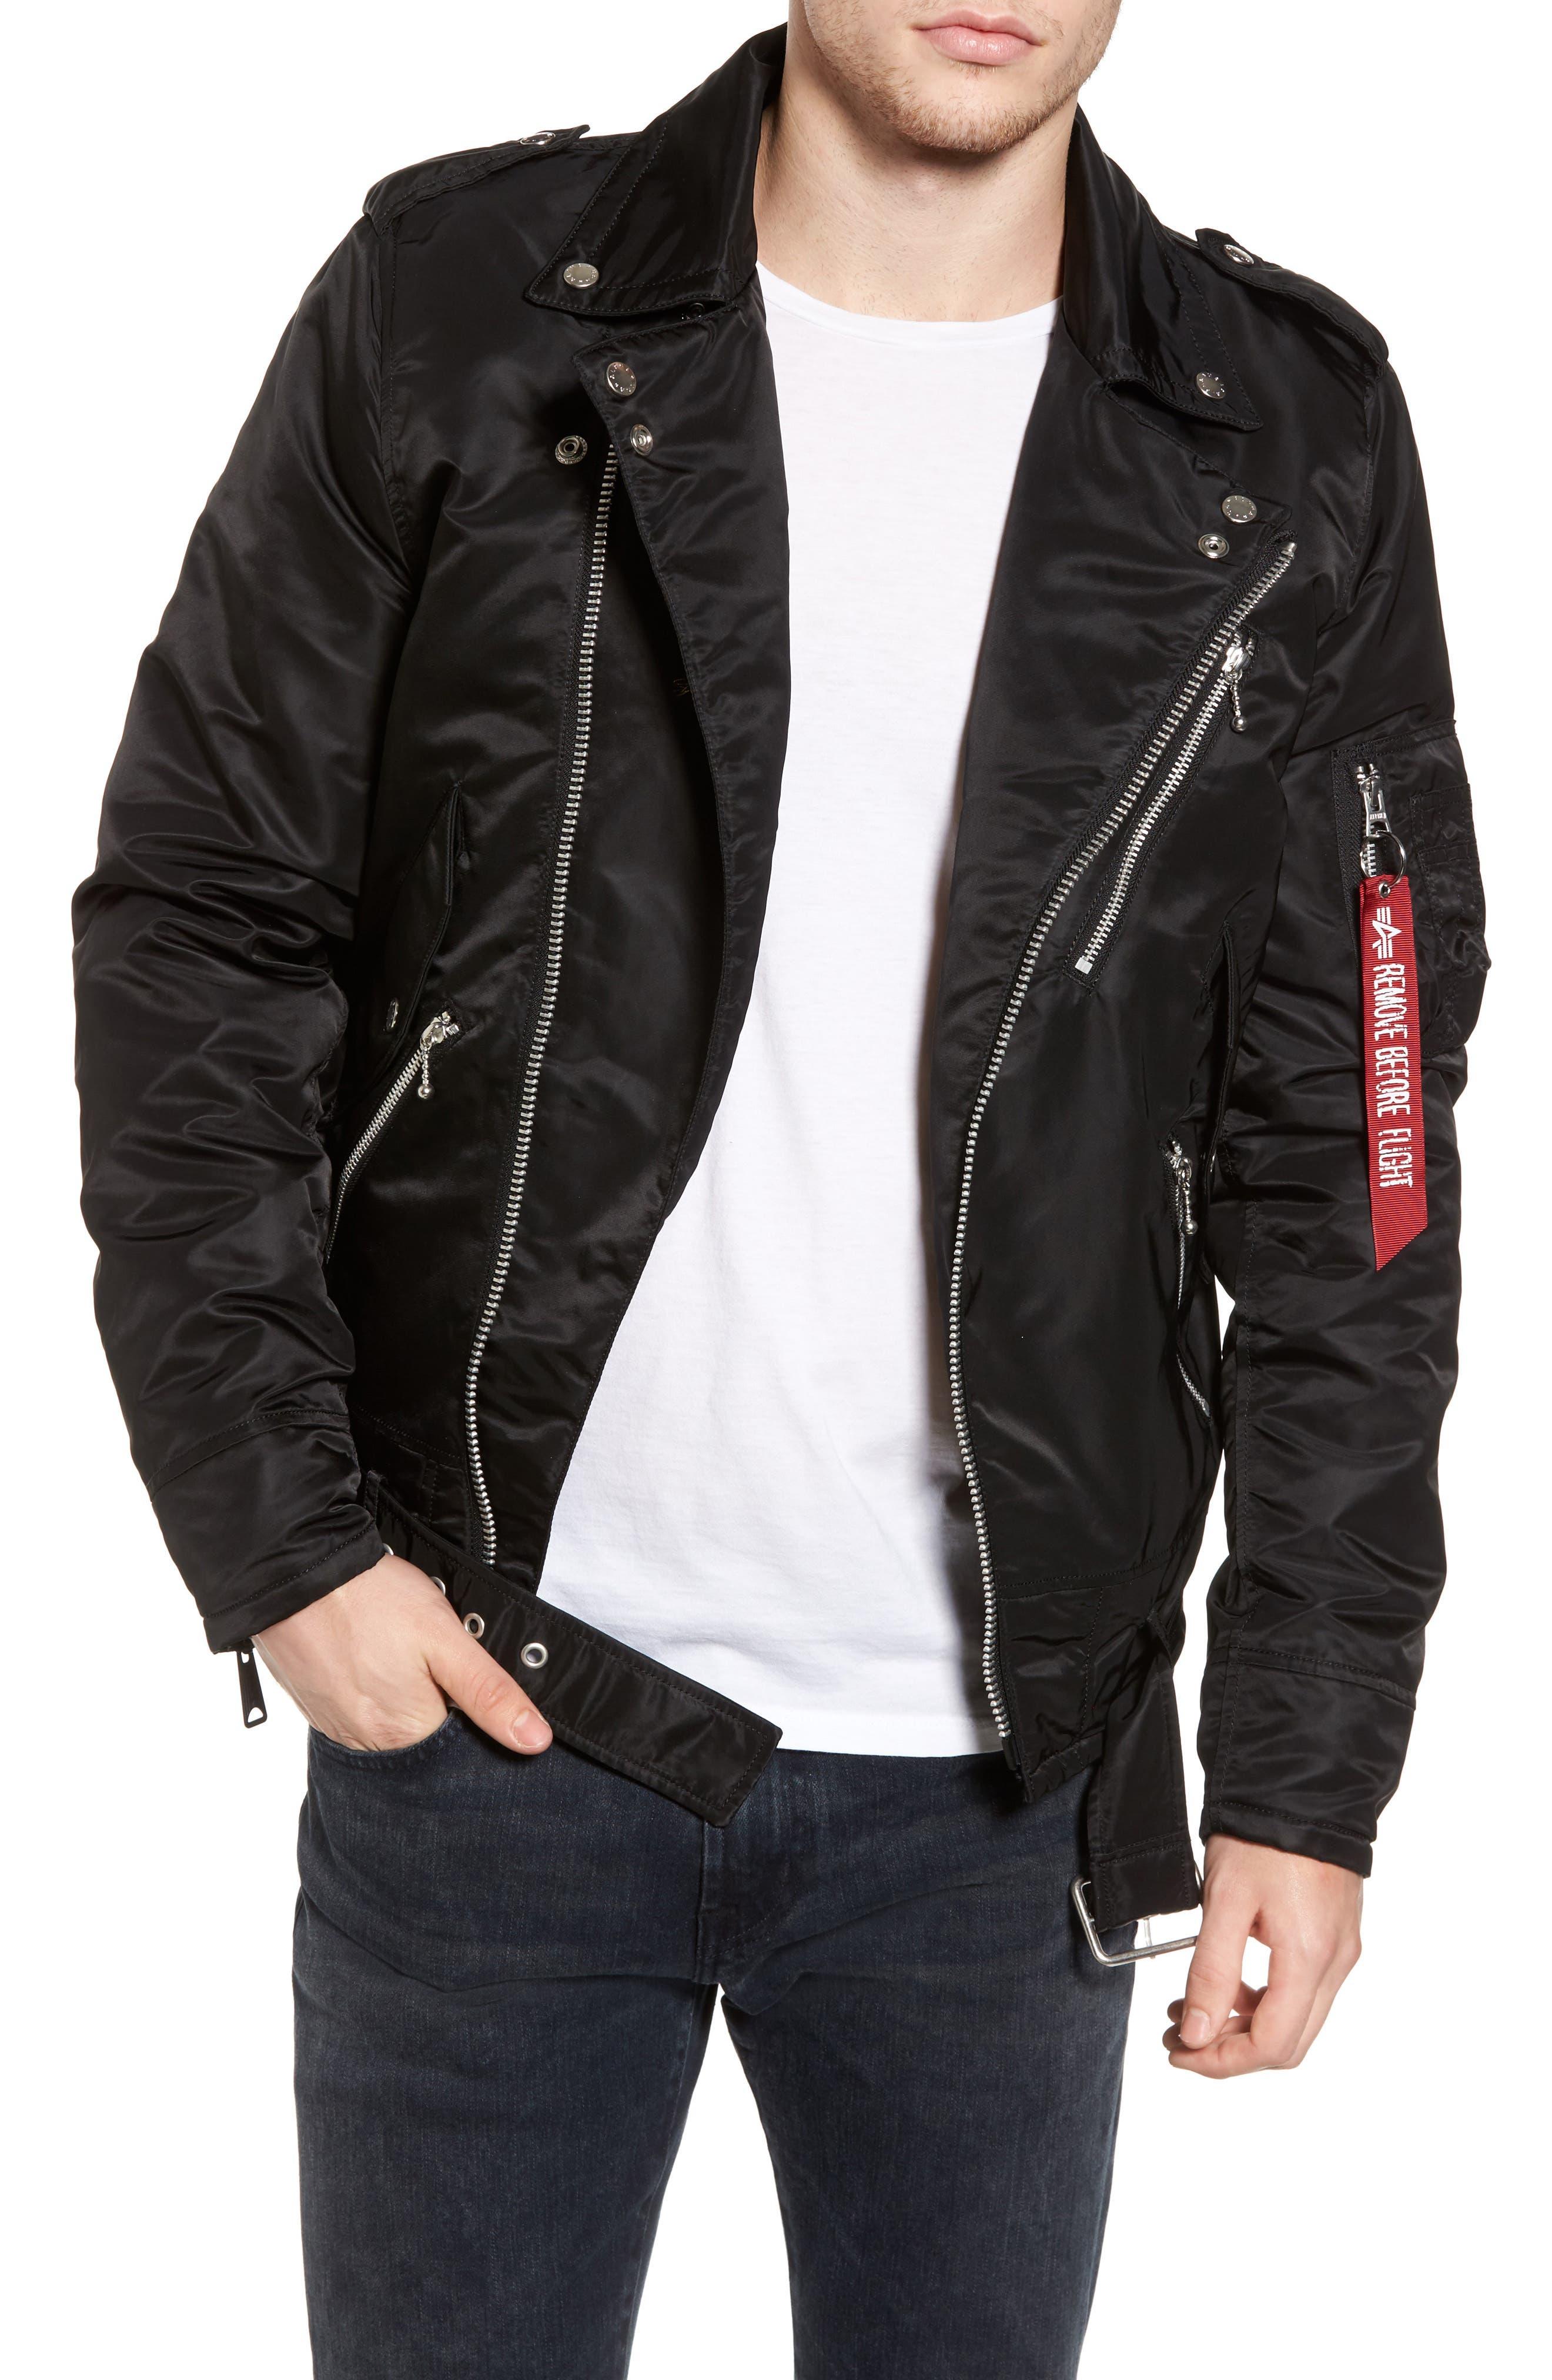 Main Image - Alpha Industries Outlaw Biker Jacket